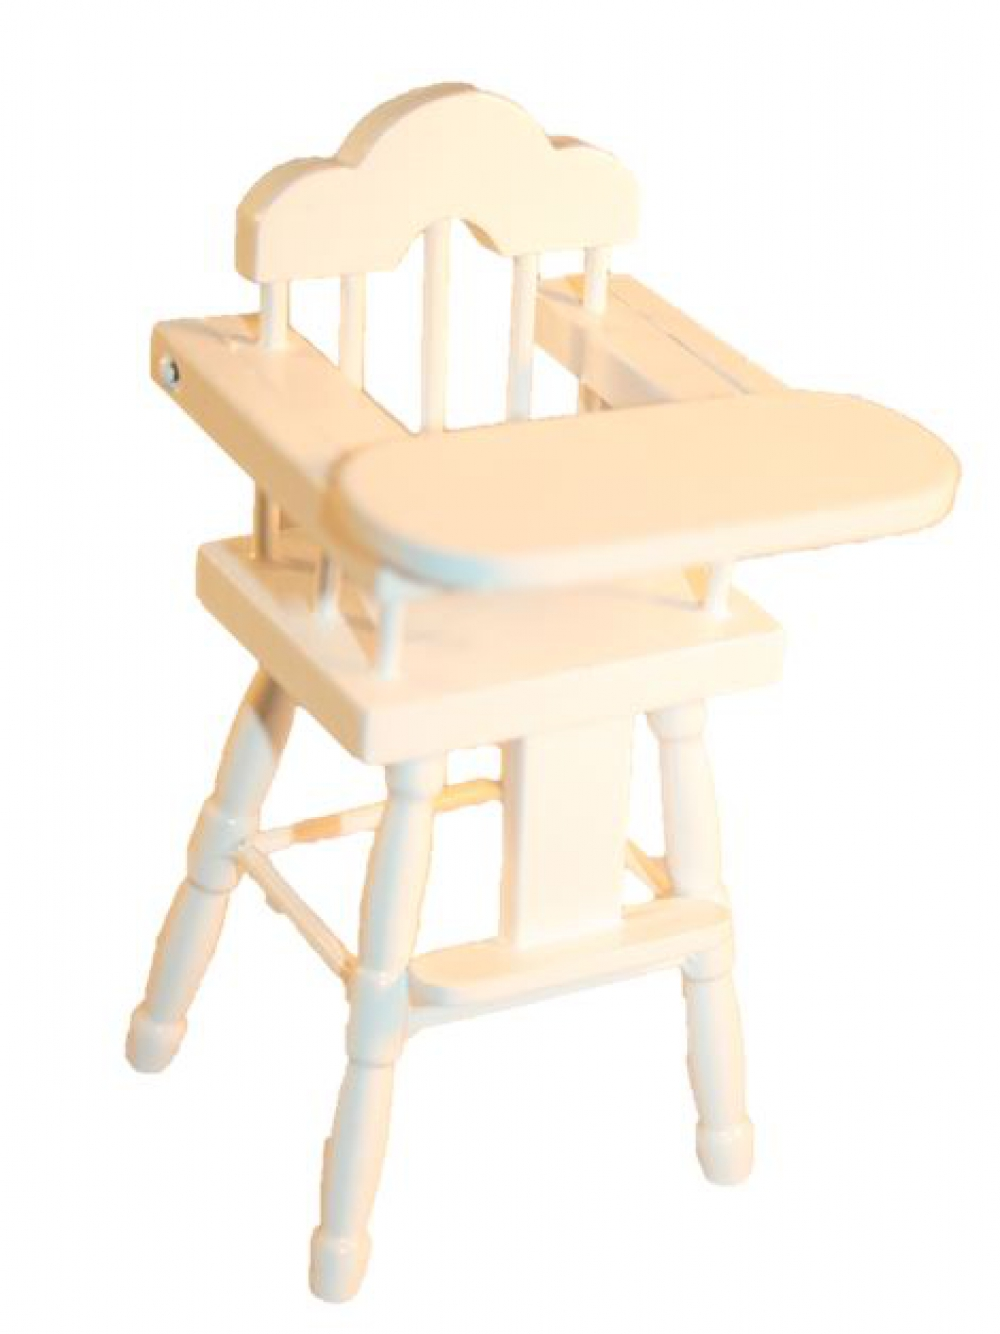 kinderstuhl hochstuhl wei lackiert 1 12 sk spielwaren. Black Bedroom Furniture Sets. Home Design Ideas